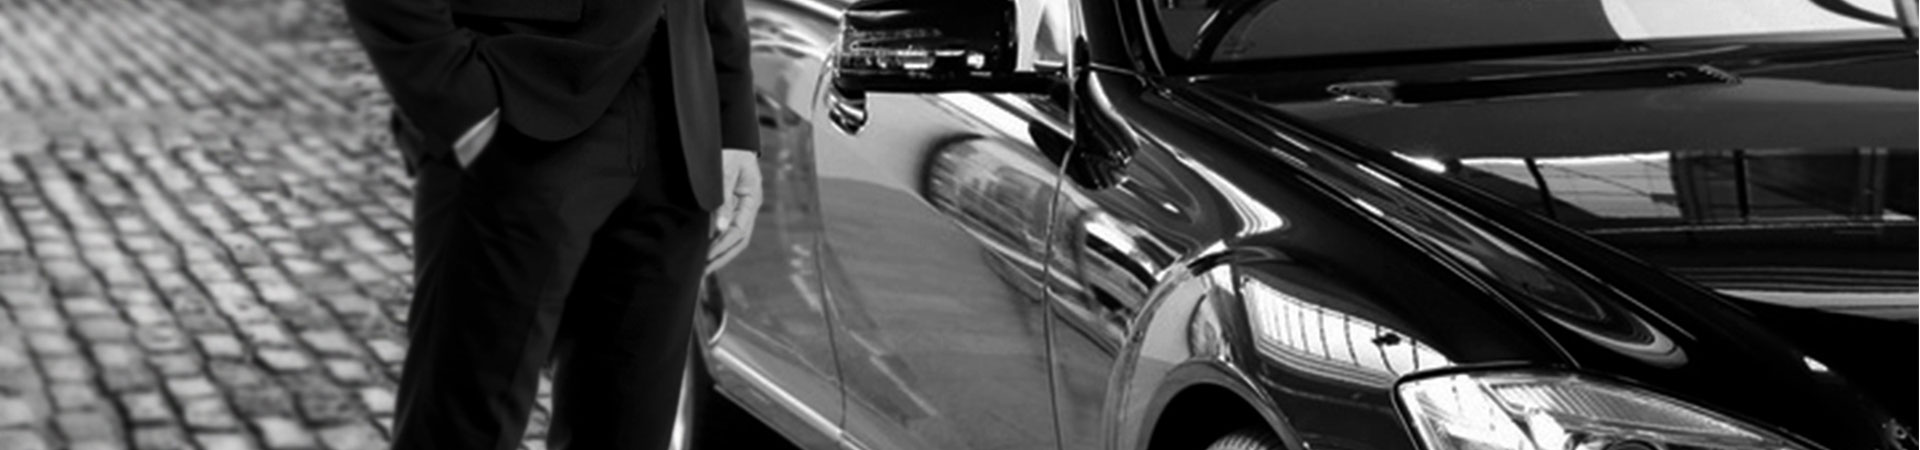 Elite VIP, private car, security company